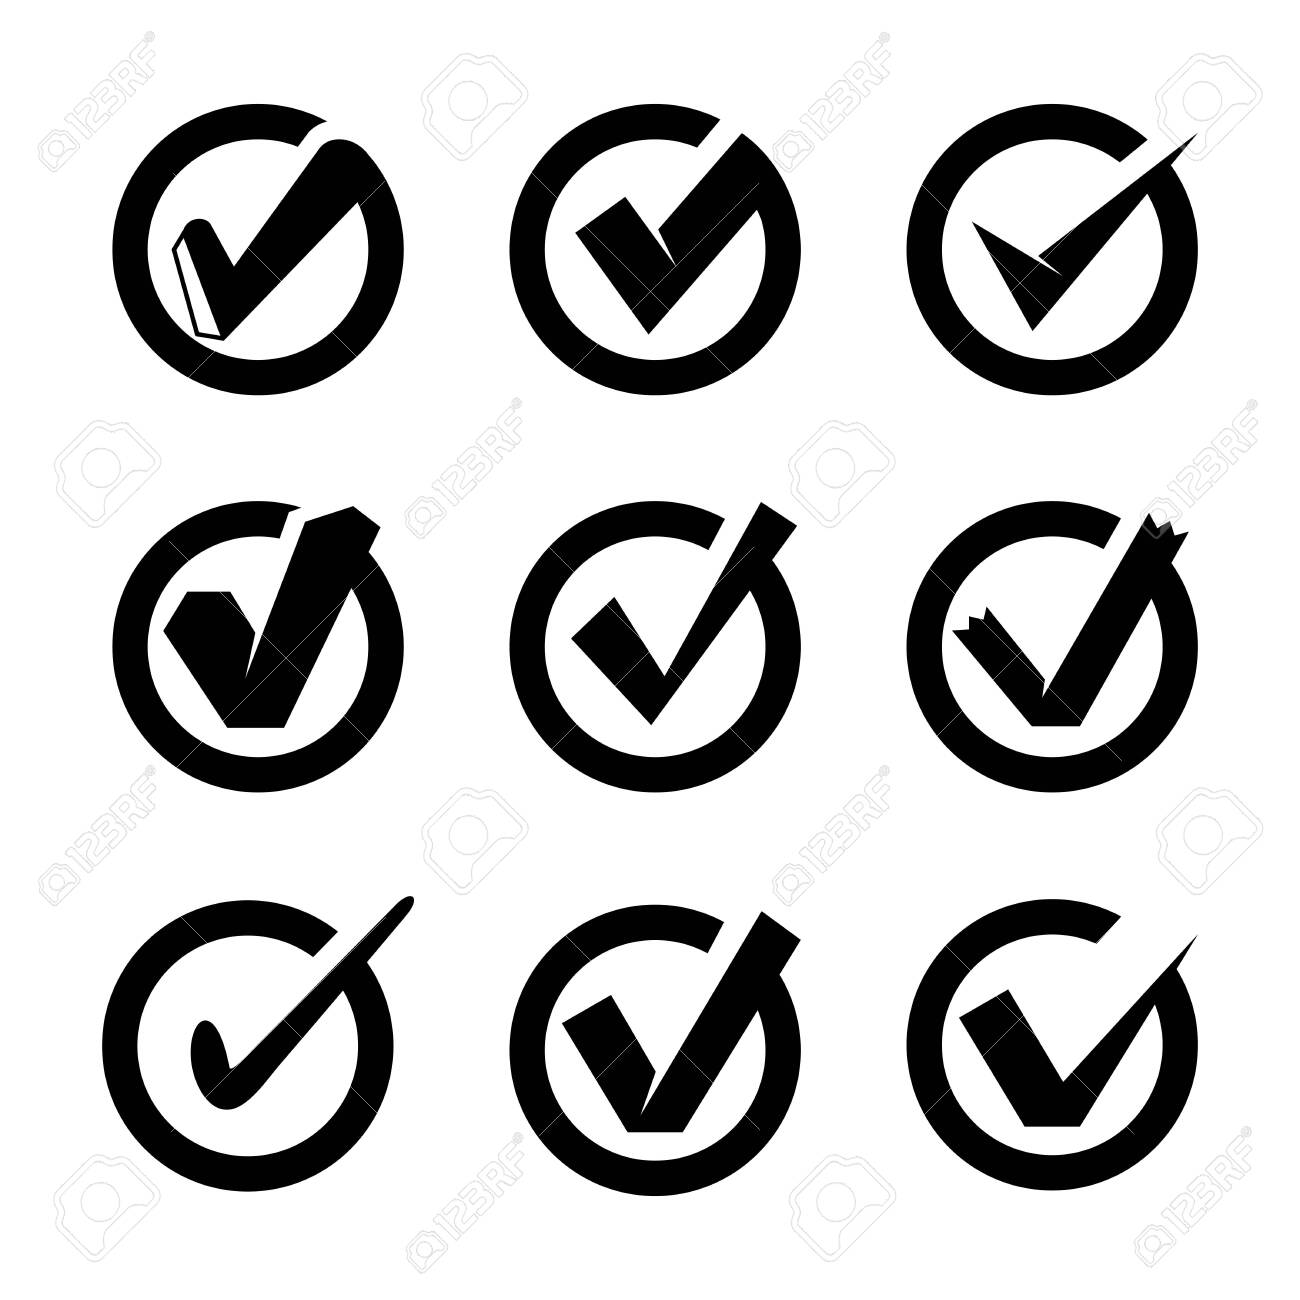 check list and tick symbols set - 148216089